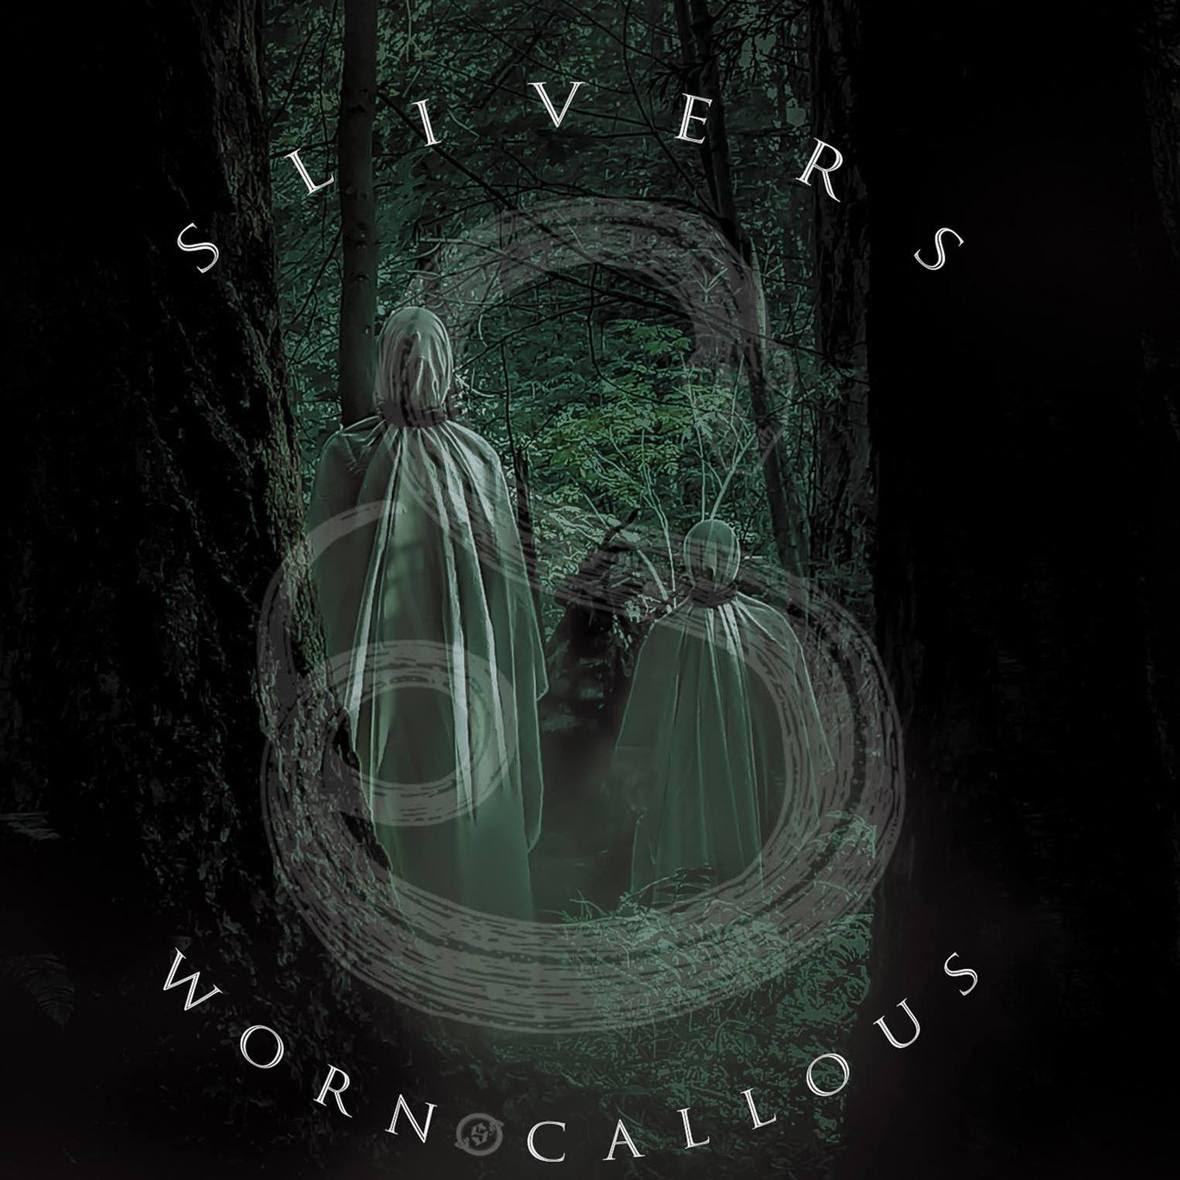 Worn Callous EP artwork